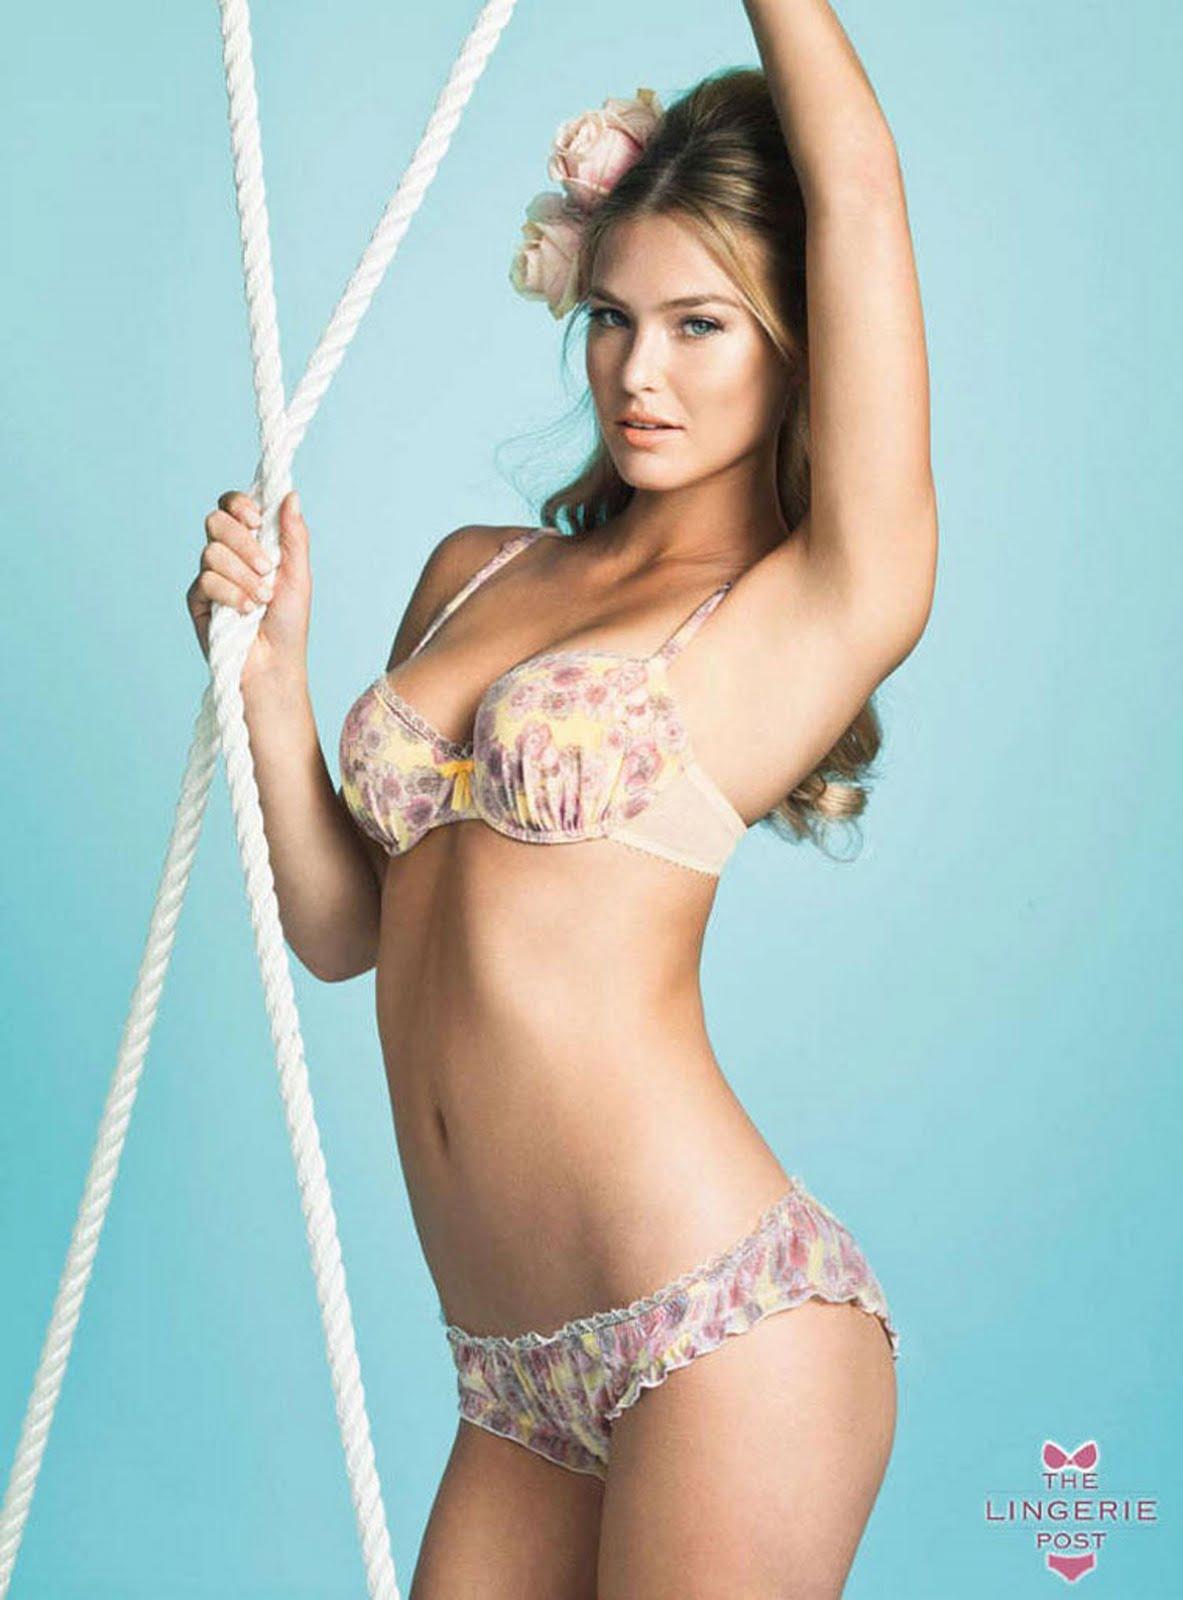 chicas mallu en fotos de bikini